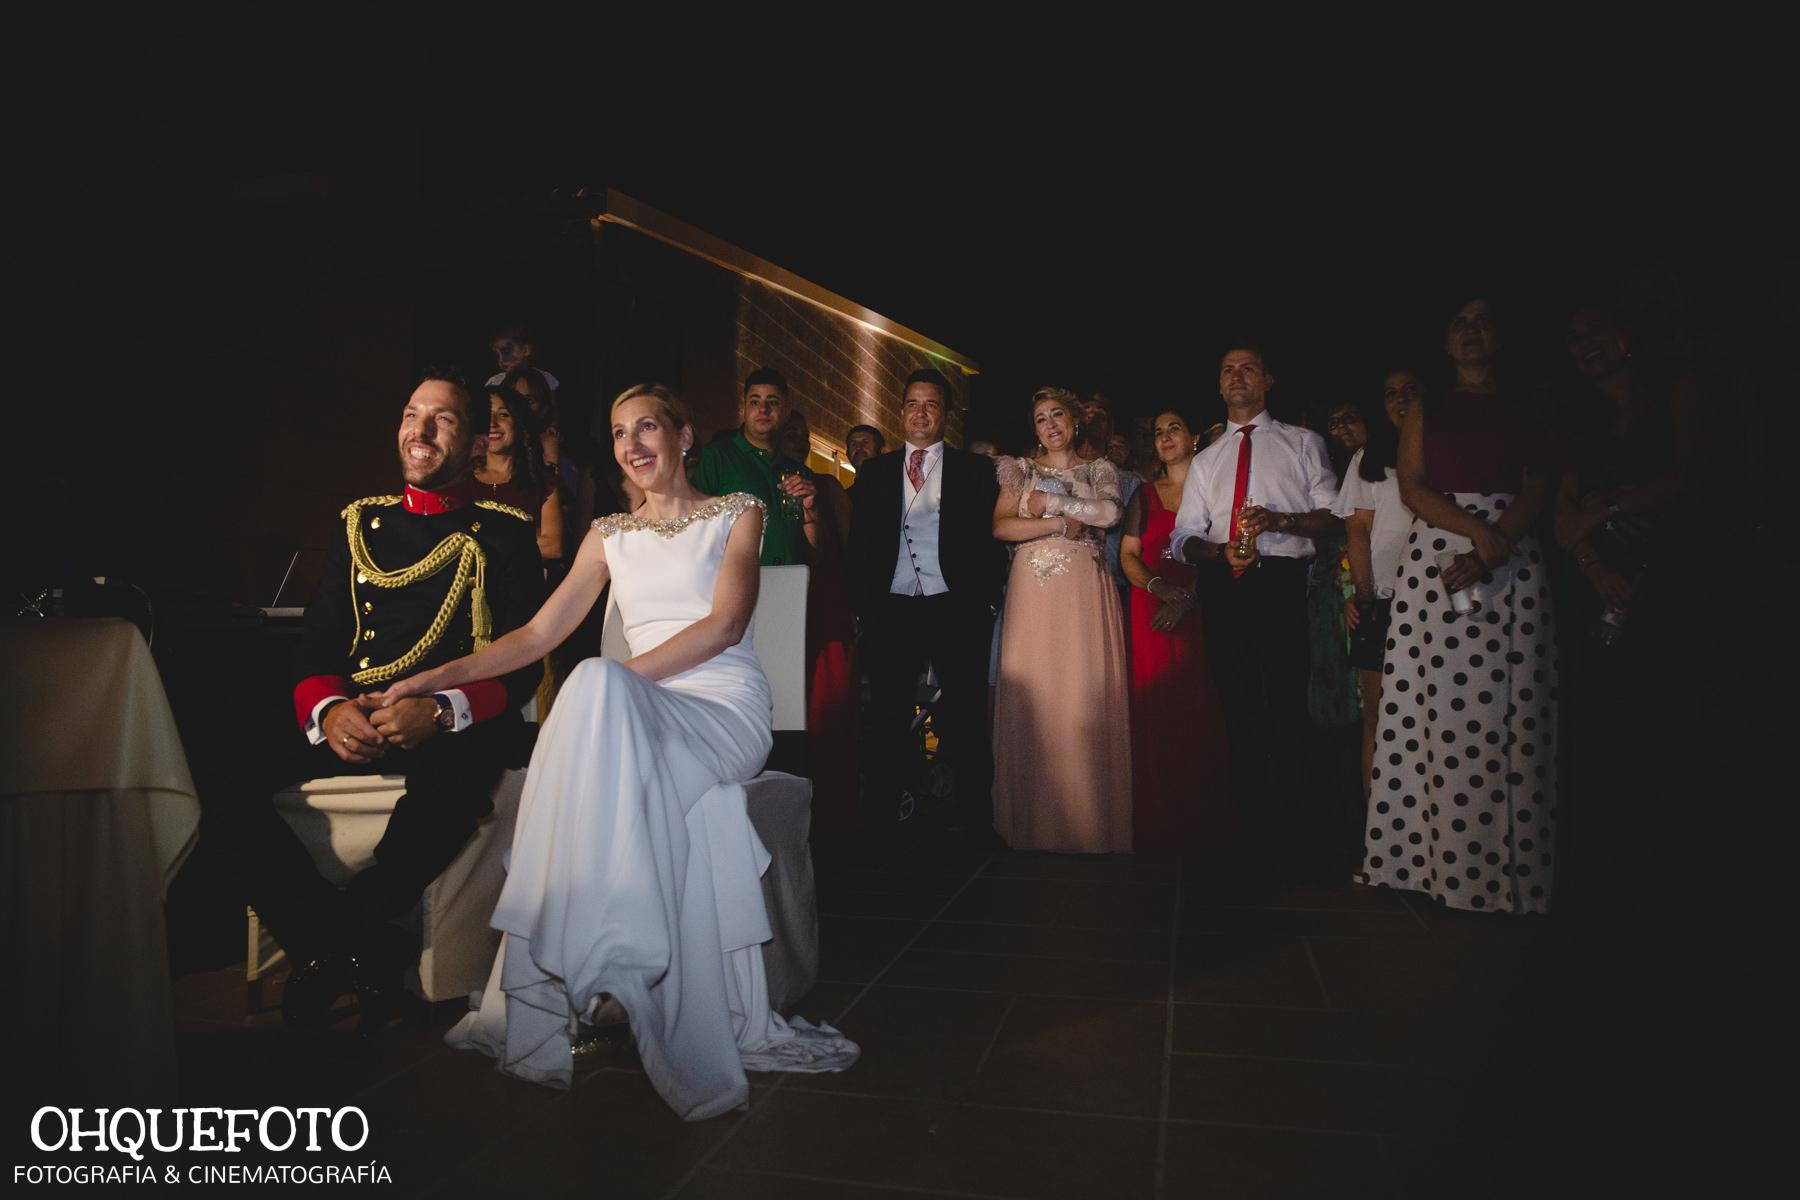 boda-en-Zarza-Capilla-y-la-Finca-la-Peraleda-chillon-ohquefoto-reportaje-de-boda-cordoba